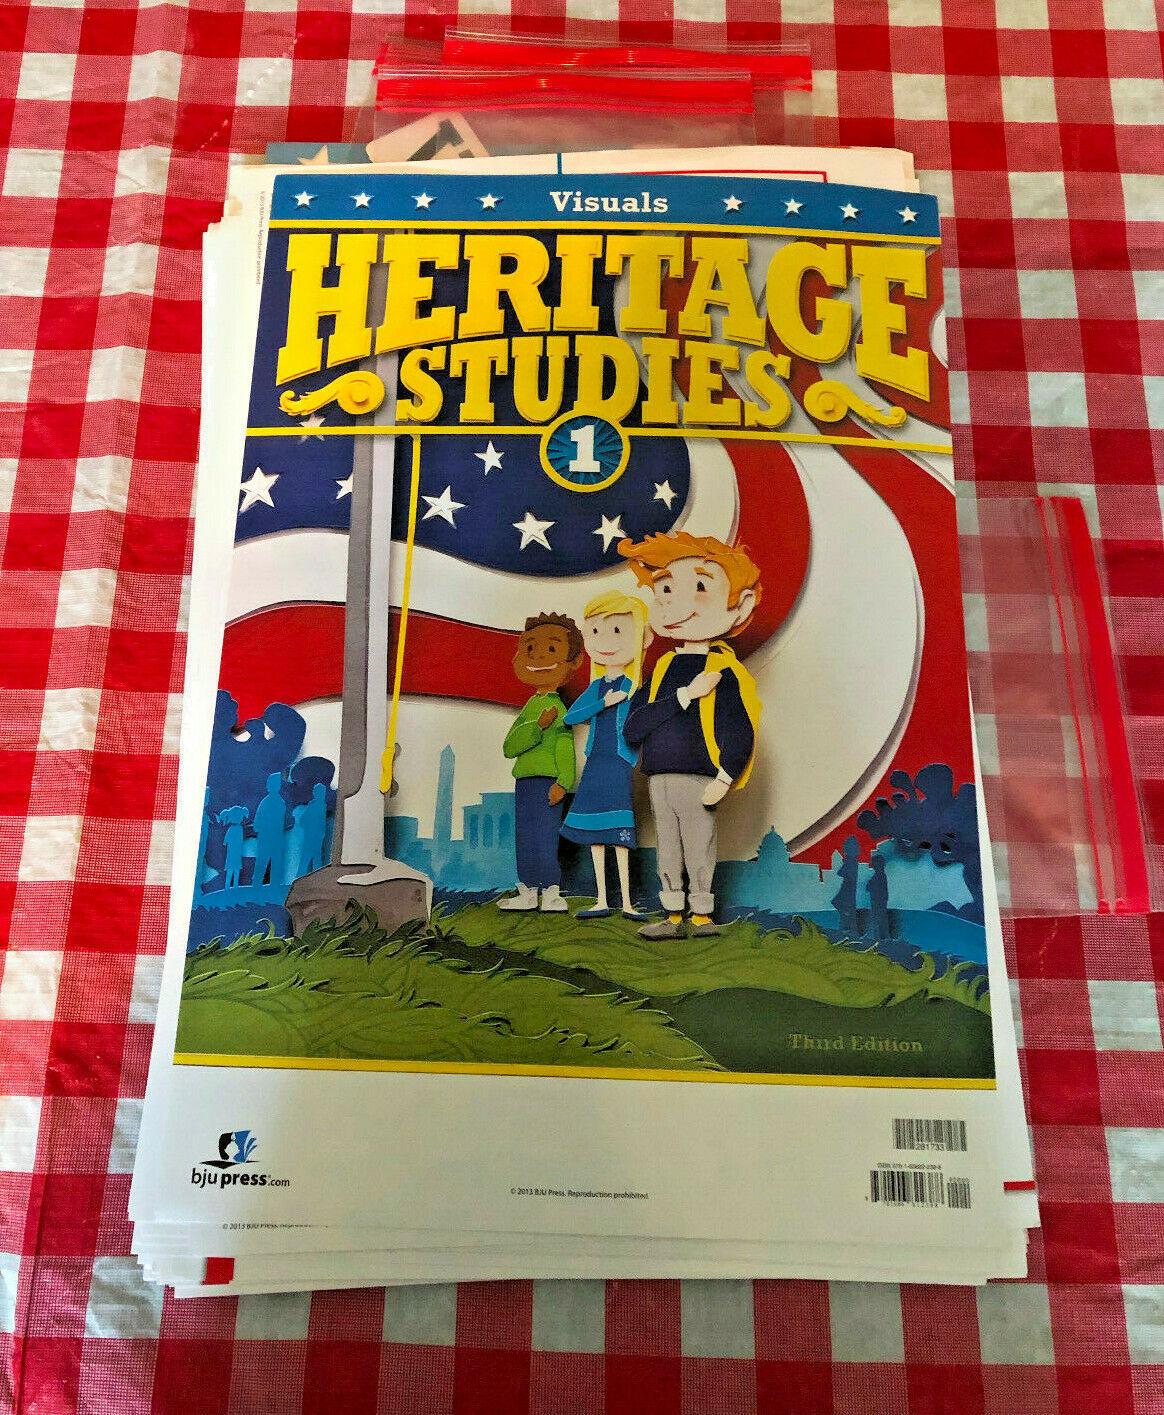 Bob Jones University Press: Heritage Studies 1 - Visuals (2013)